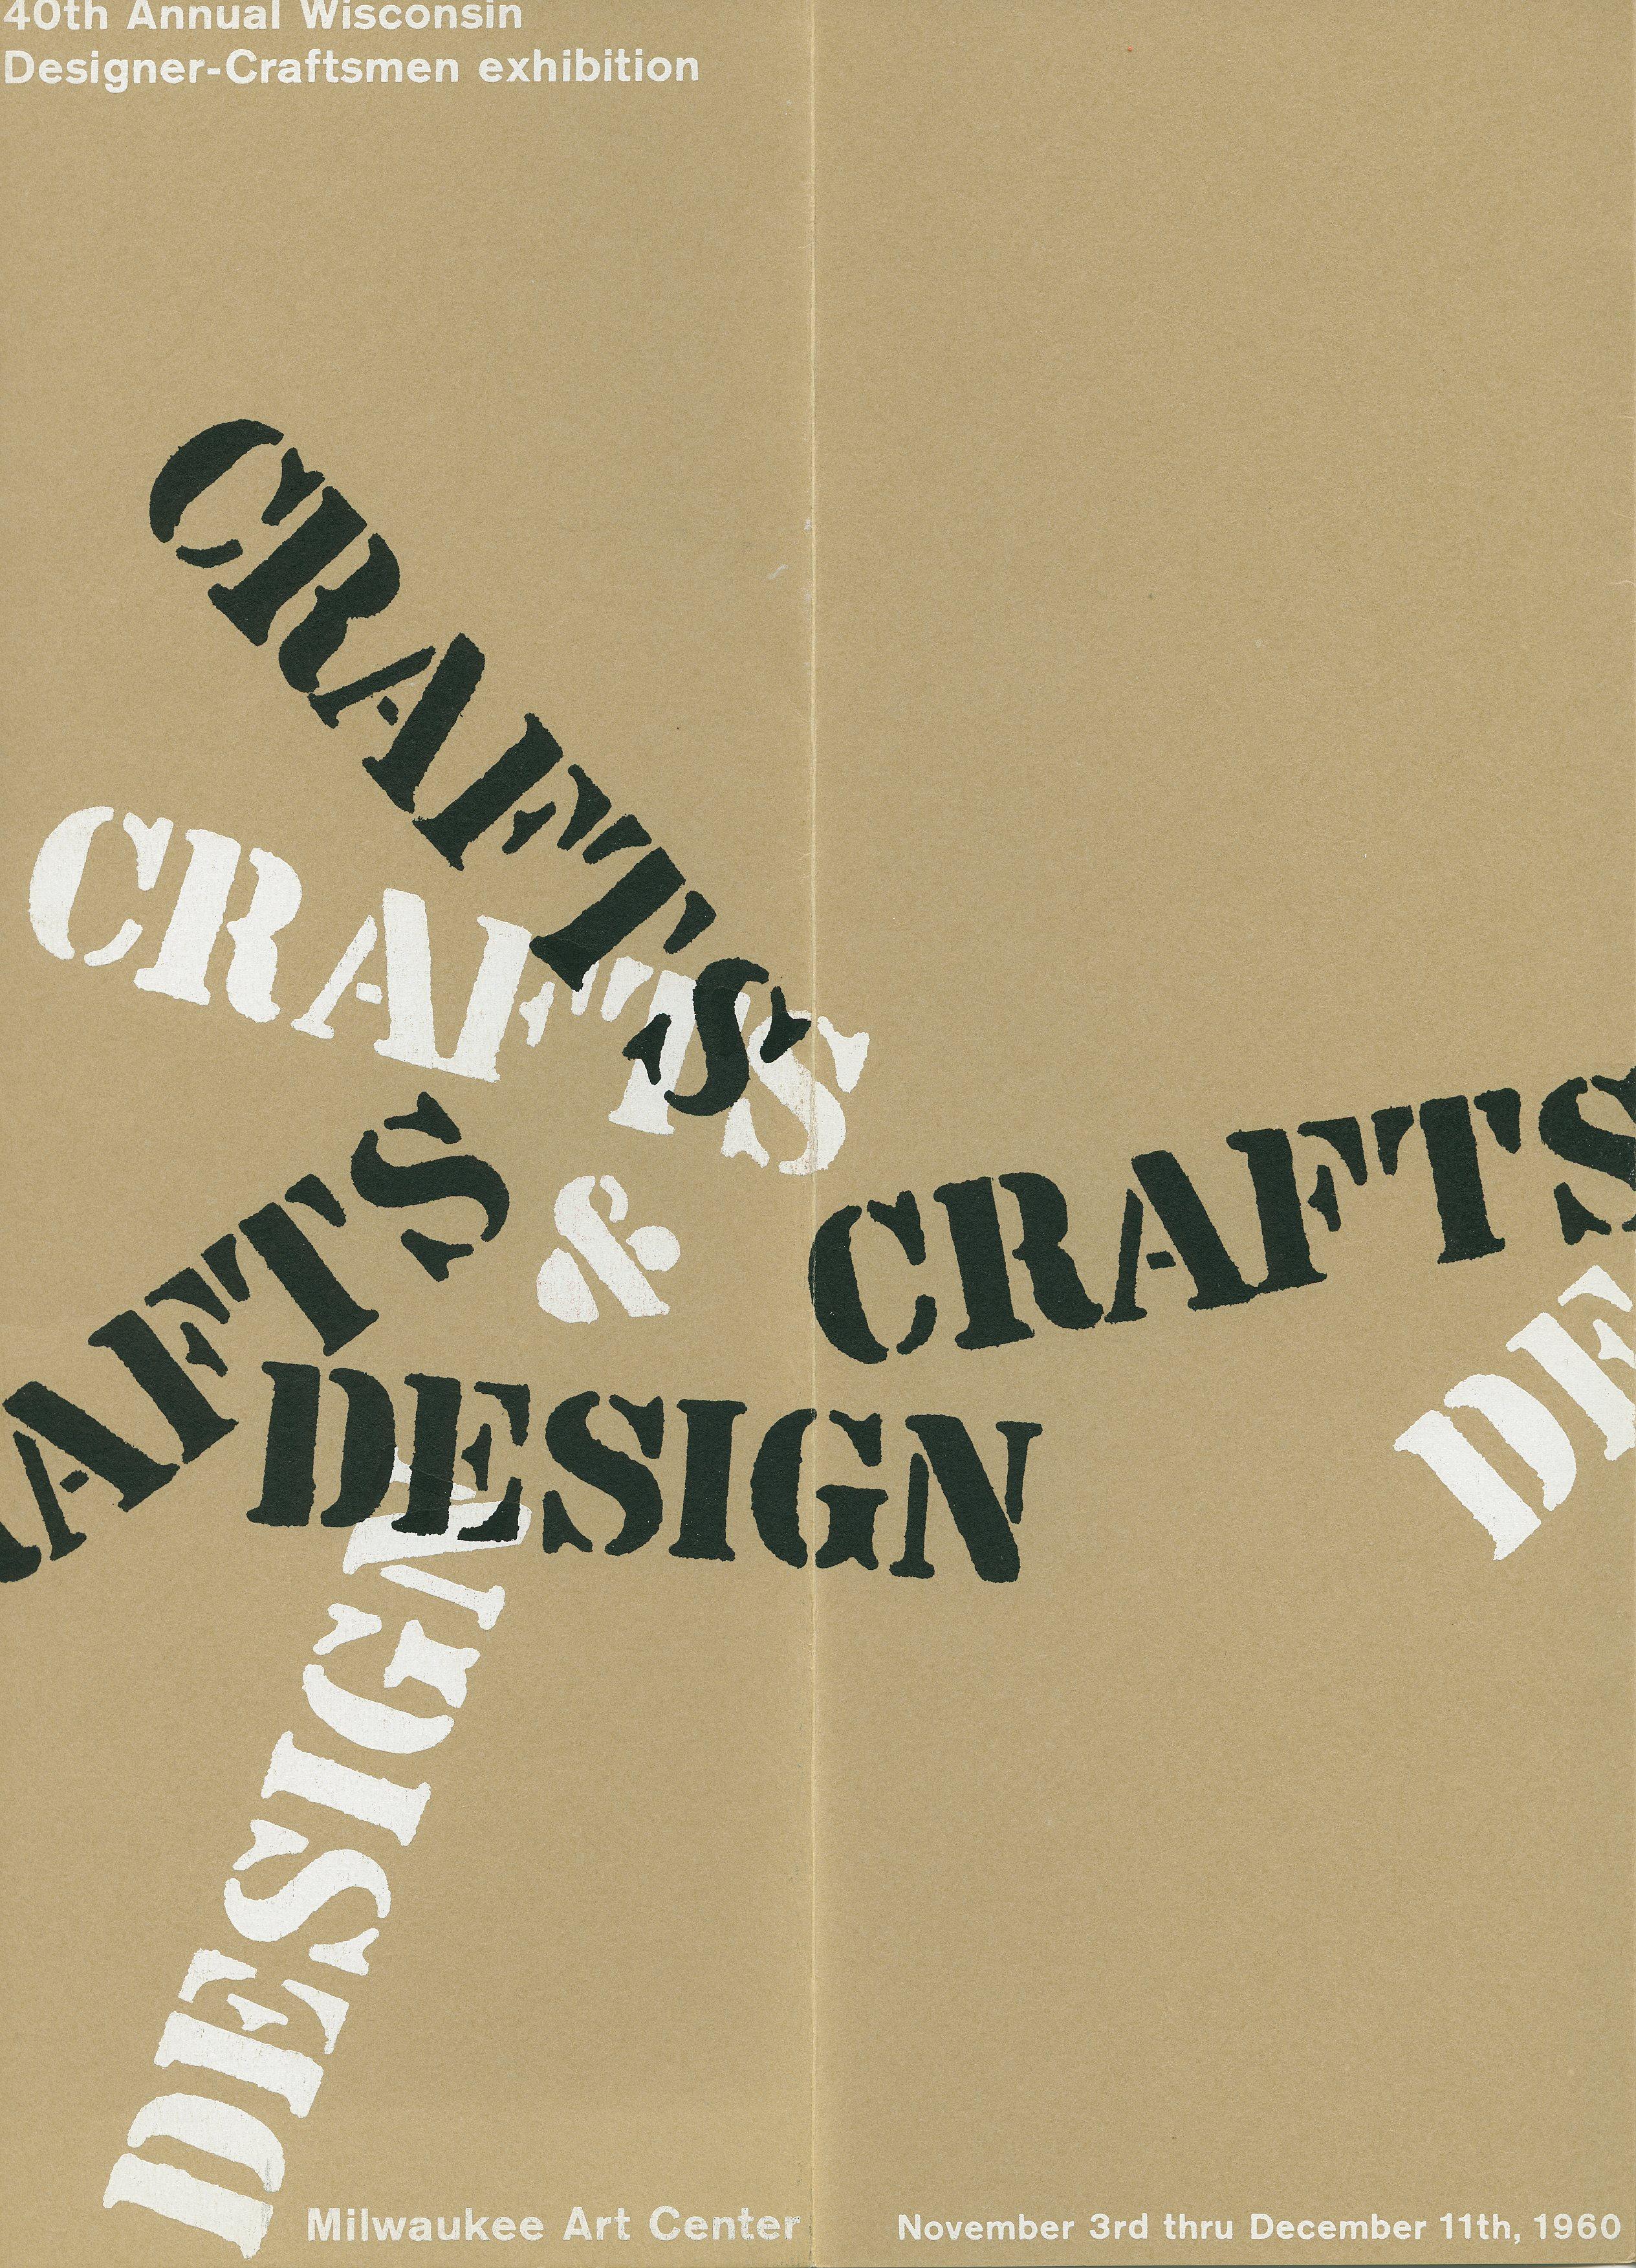 John J. Reiss, exhibition catalogue. 40th Wisconsin Designer Craftsman Exhibition, 1960